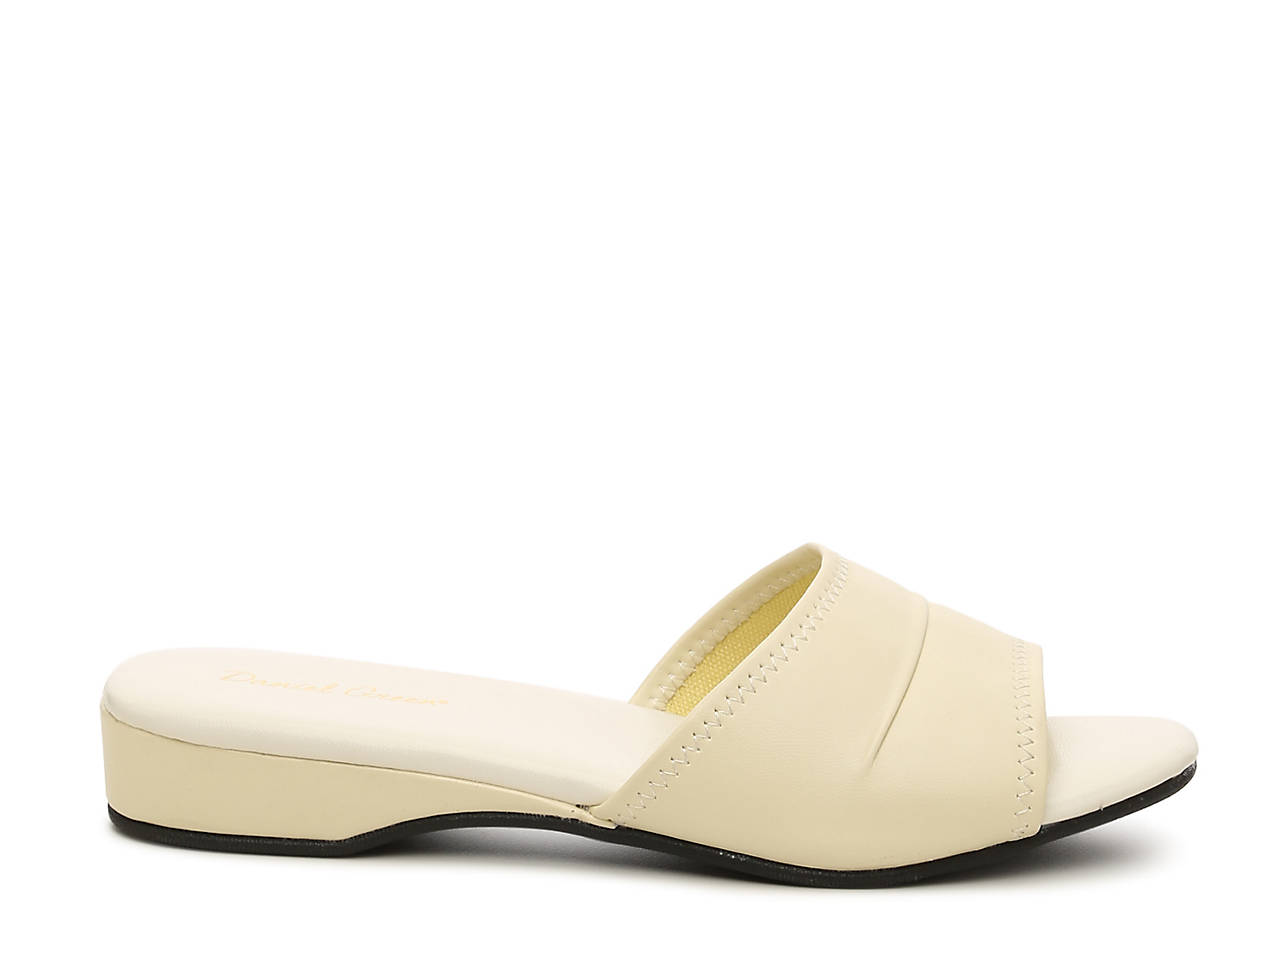 eb26cb0b9c6f Daniel Green Dormie Slide Slipper Women s Shoes